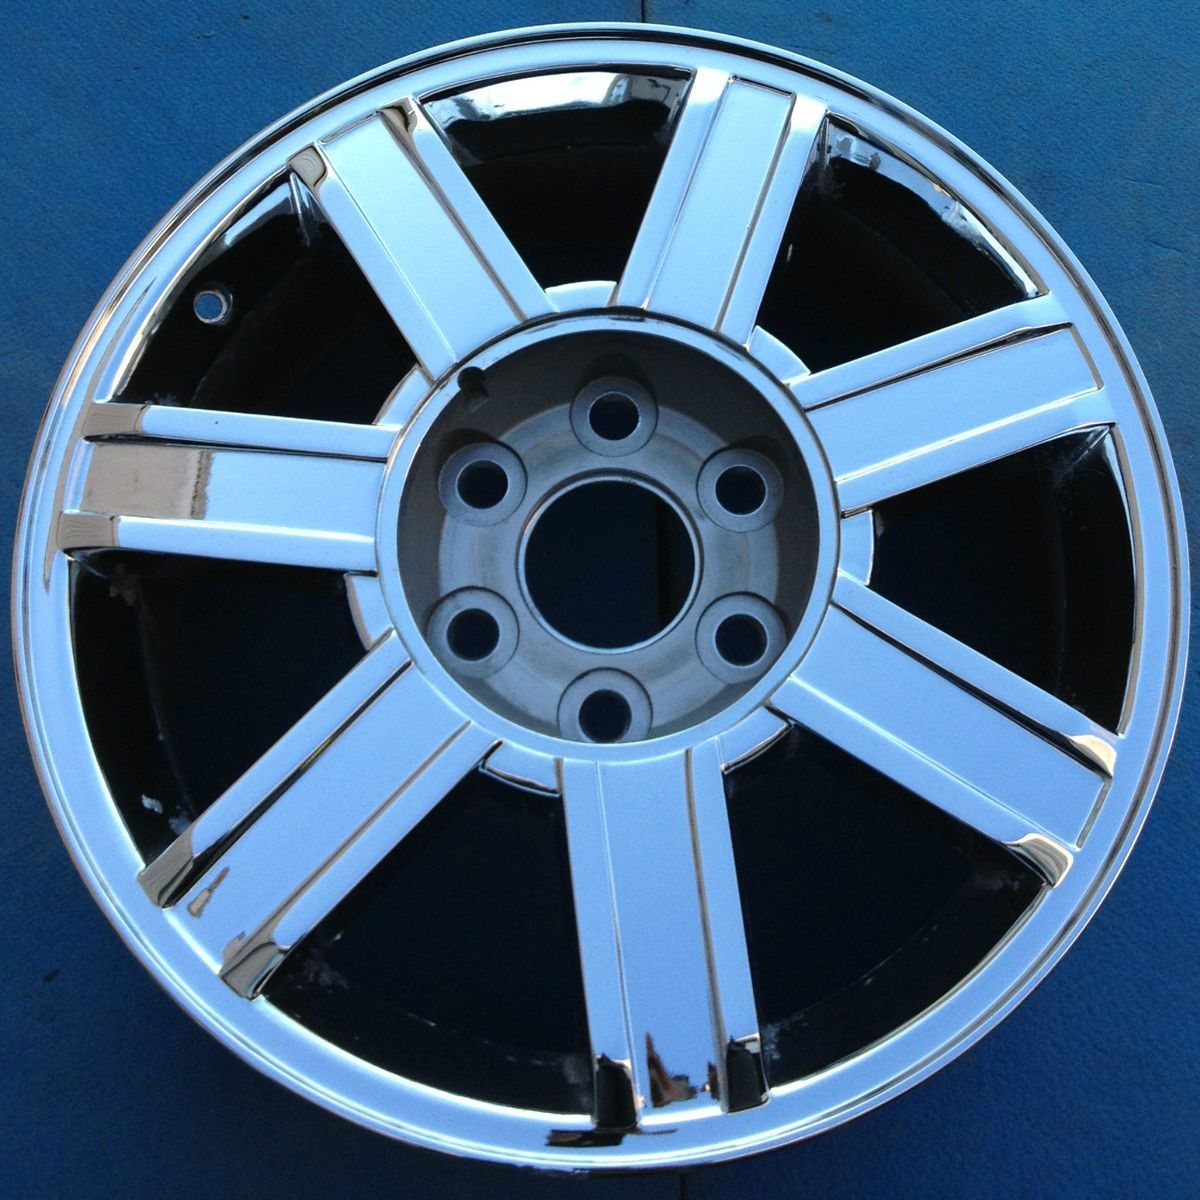 2008 2009 Cadillac Escalade Ext Esv 18 Factory Wheel Rim Chrome 5303b 2002 Wiring Harness